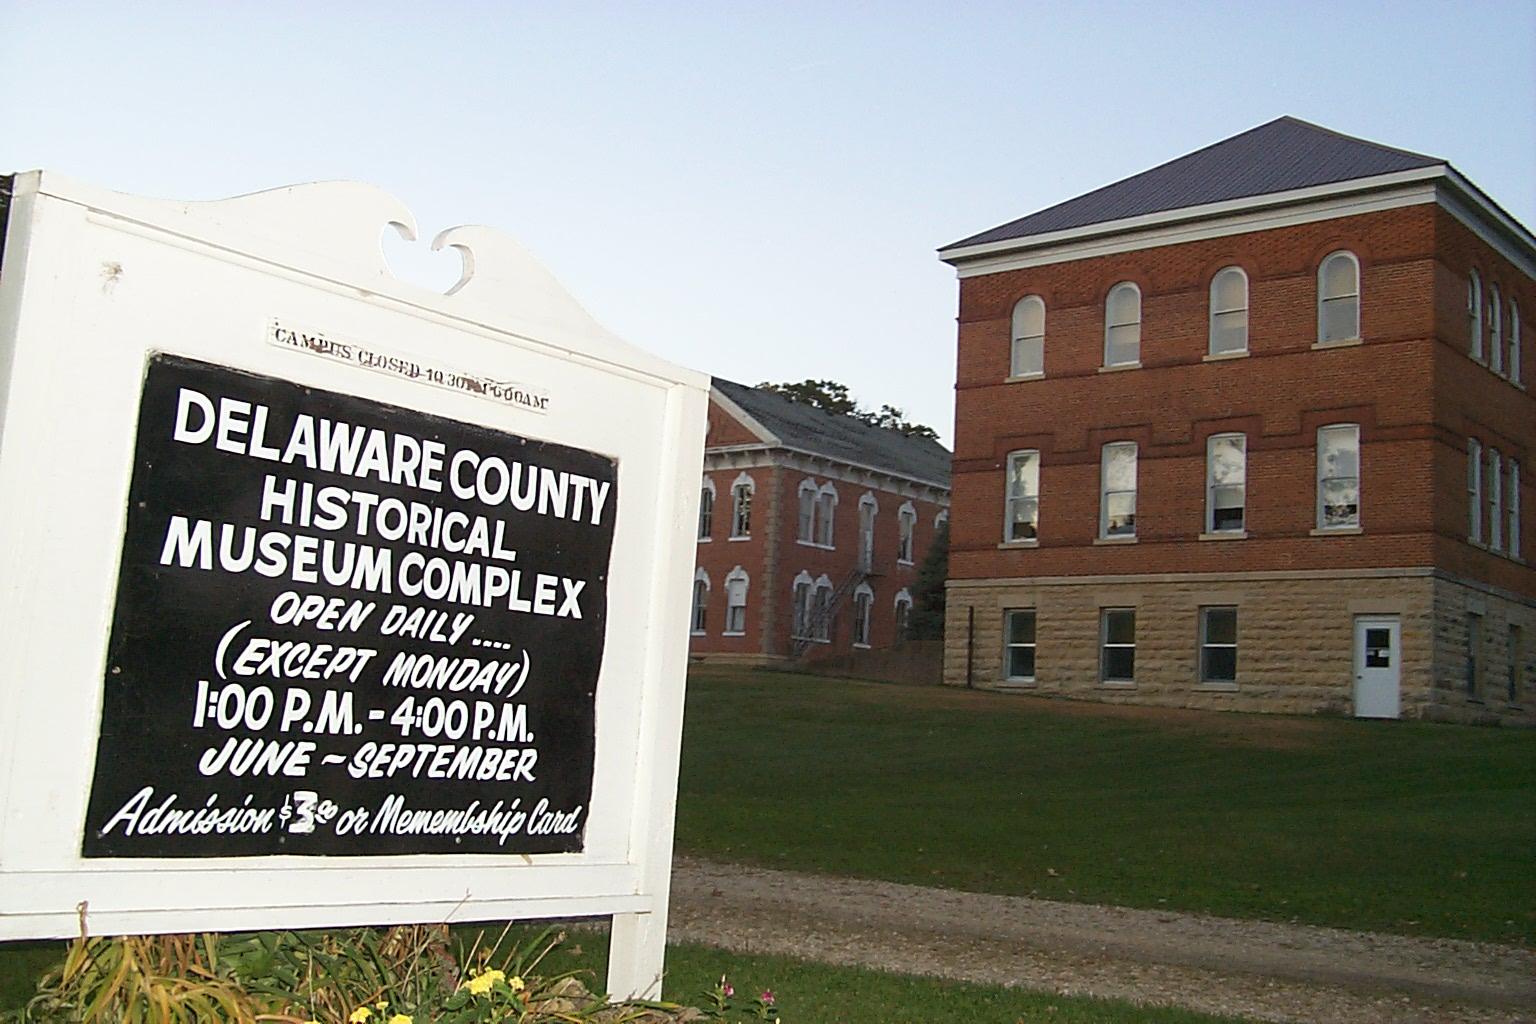 Deleware County Historical Museum Complex